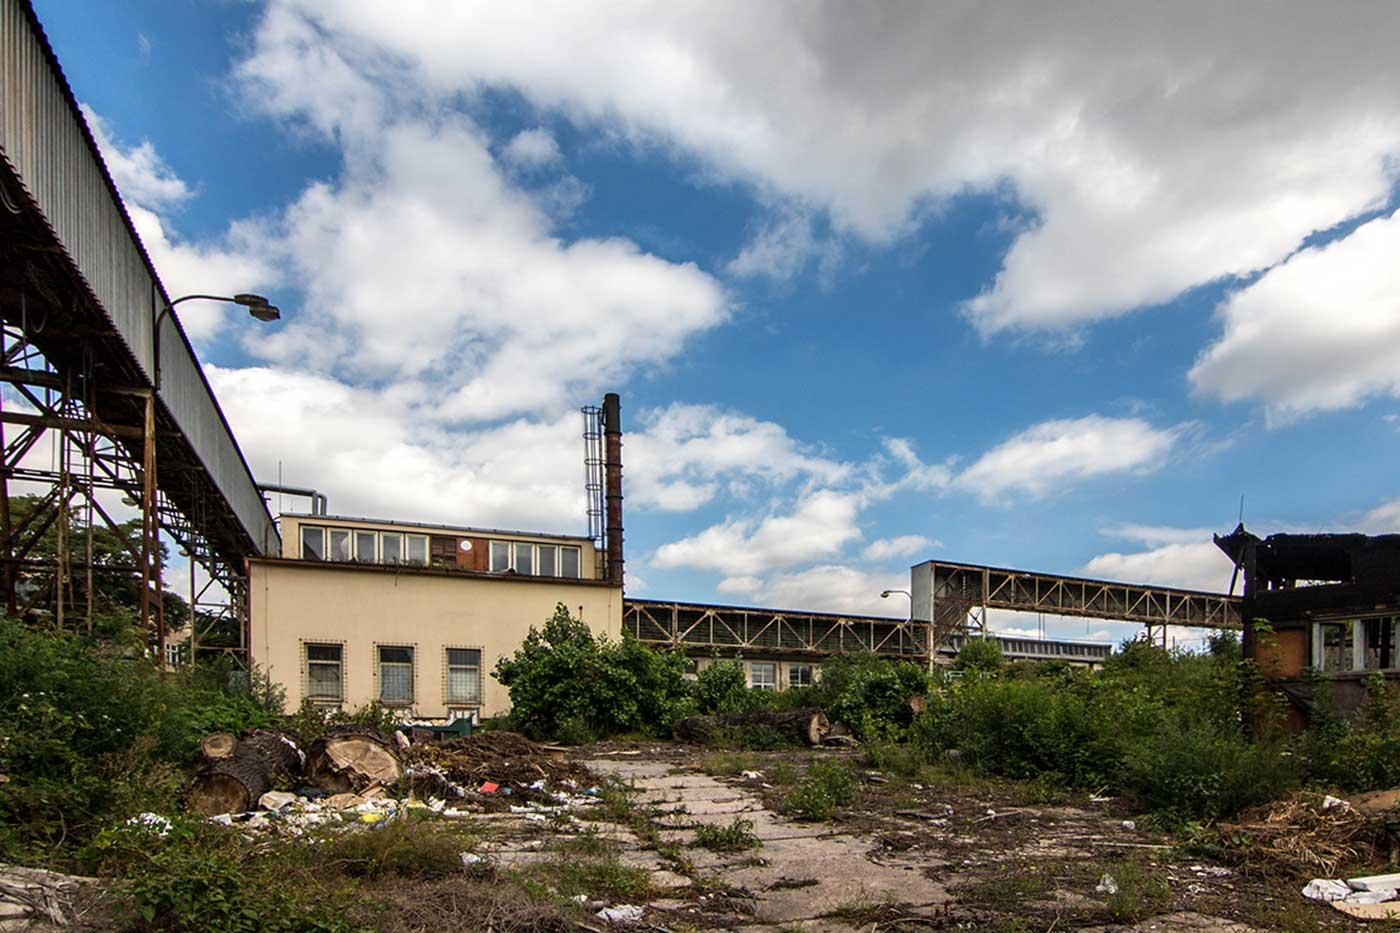 Pragovka – The Praga Car Factory in Prague, Czech Republic